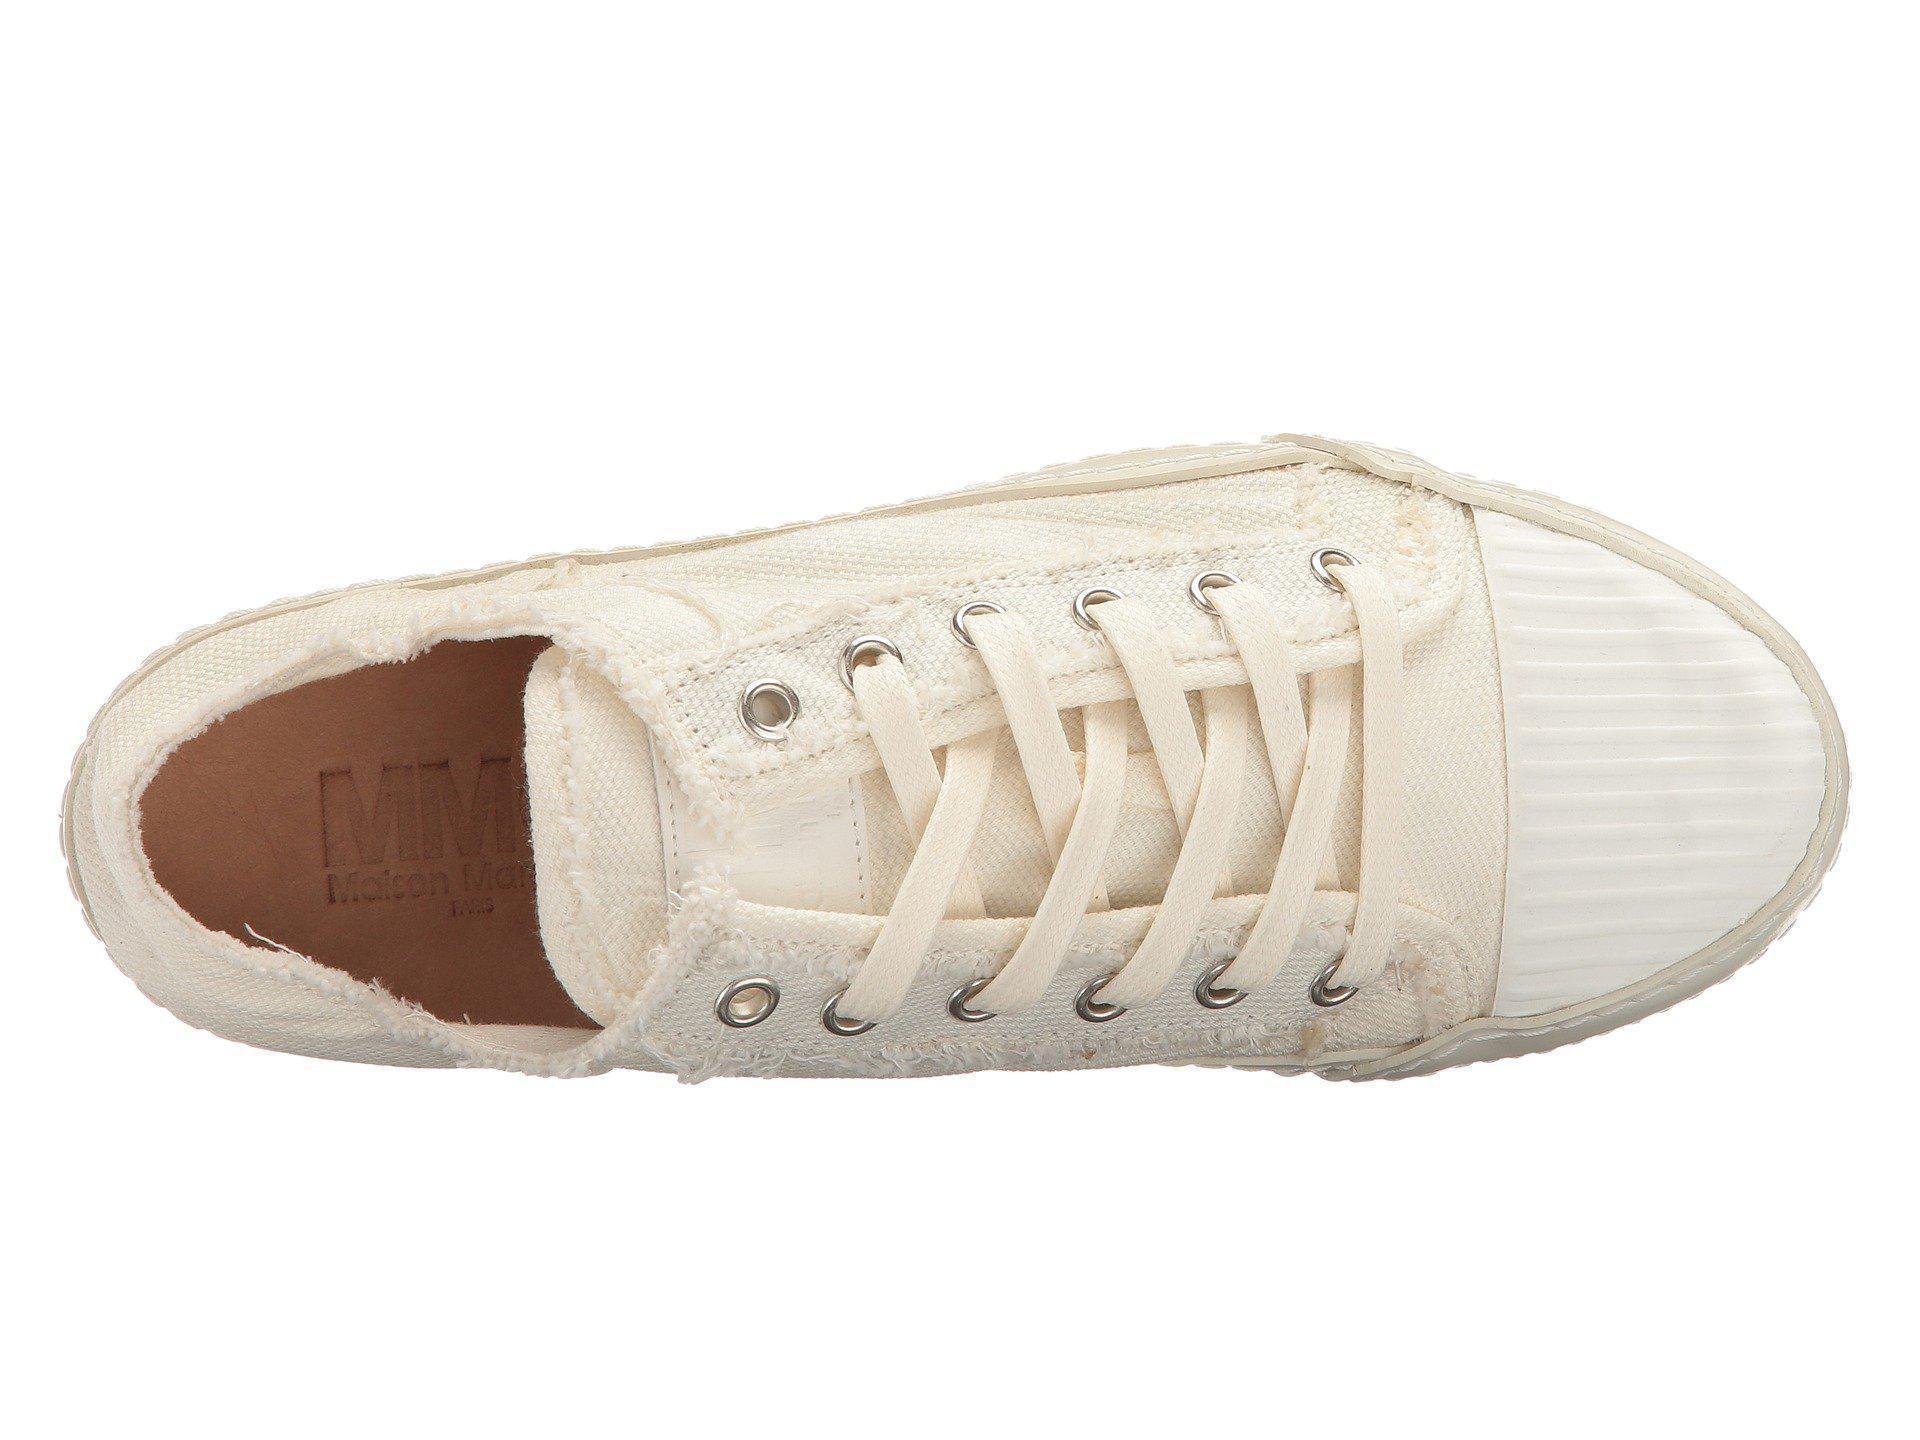 MM6 Maison Margiela Canvas Low Sneaker v7bbSML4